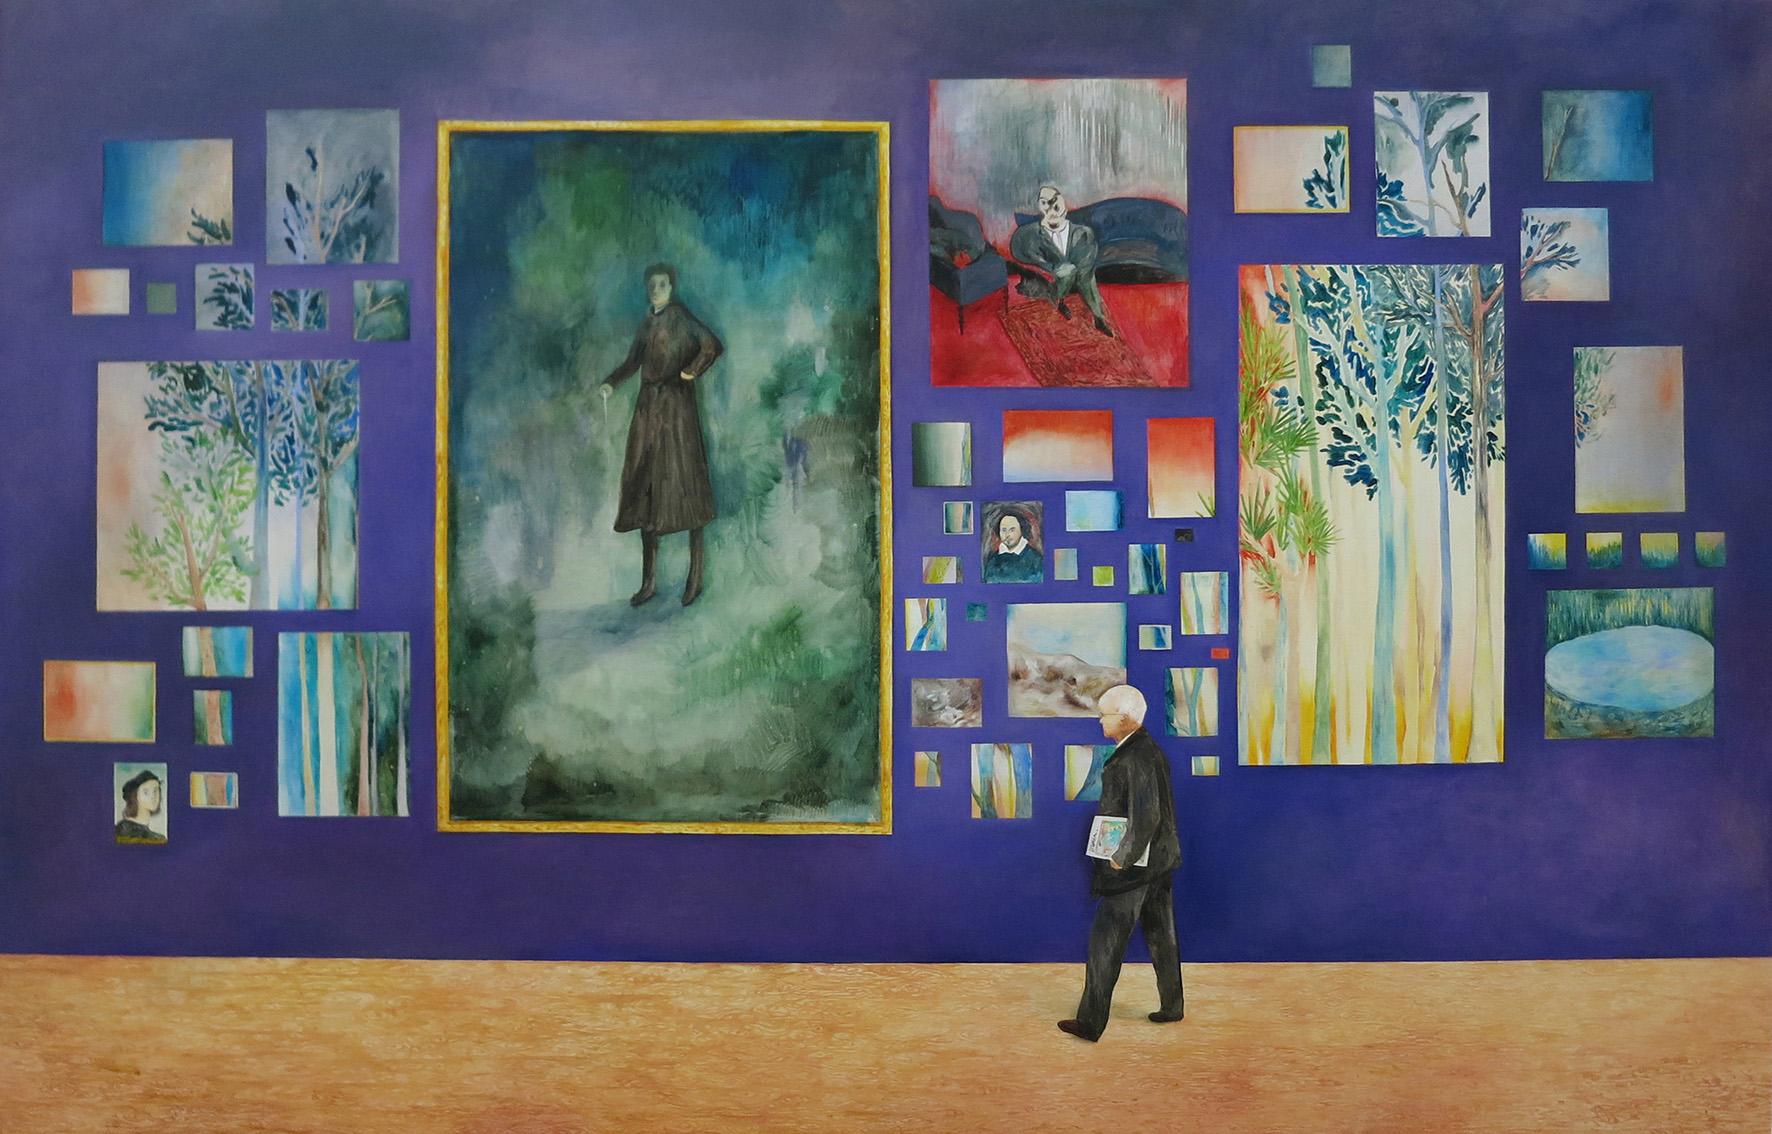 紫色的牆 The Purple Wall